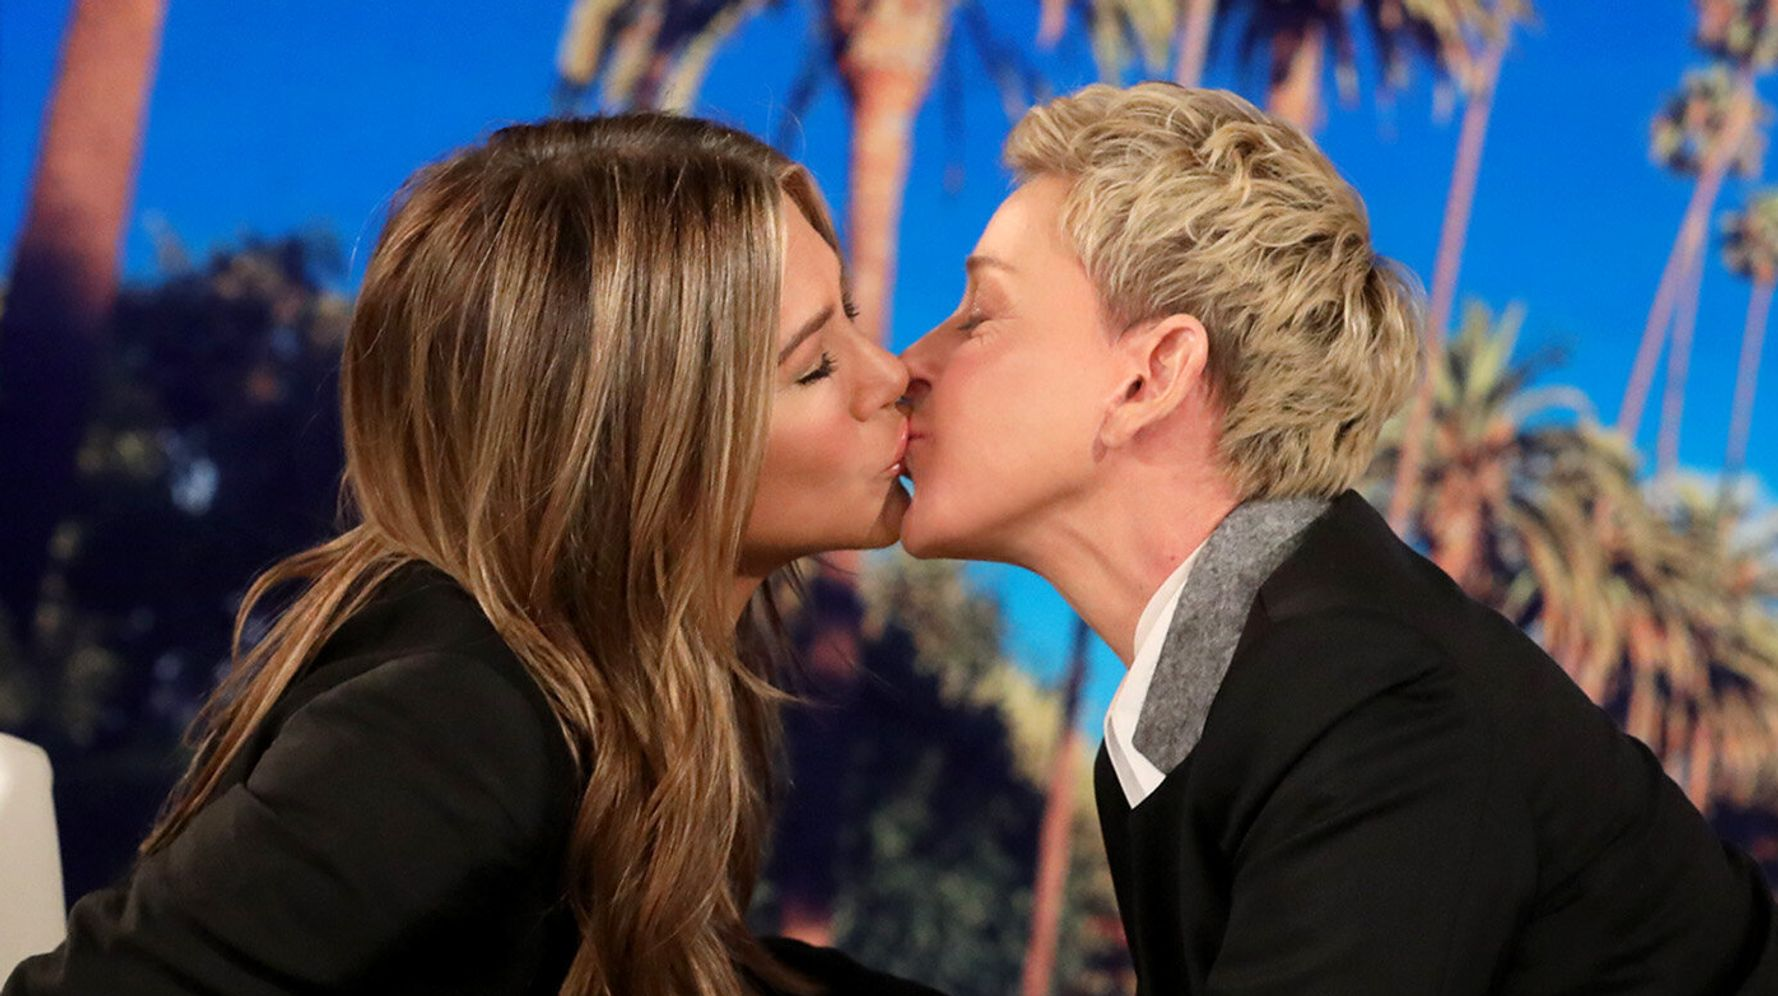 Westlake Legal Group 5db6fb6c210000063334b40f Jennifer Aniston Kisses Ellen DeGeneres For The Perfect Instagram Photo Op